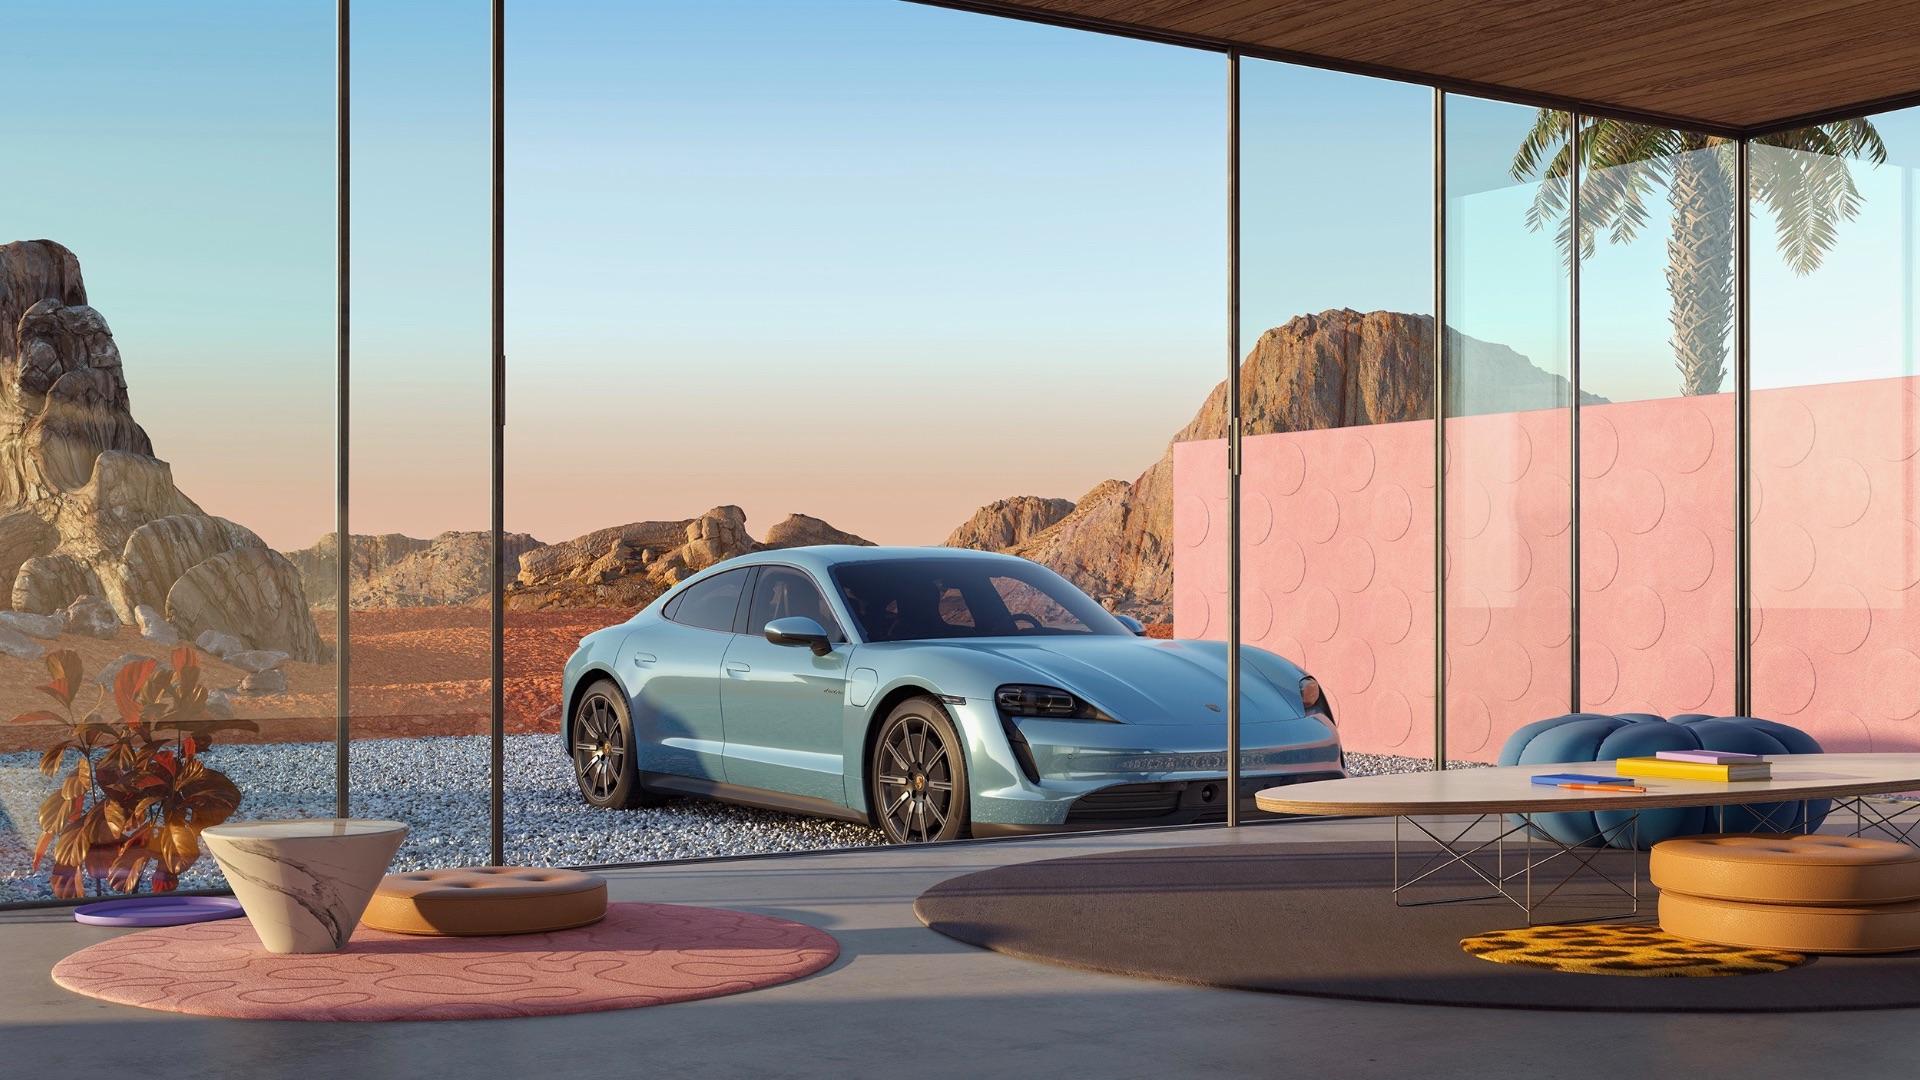 Electric Porsche Taycan Falls Short In Range Tests